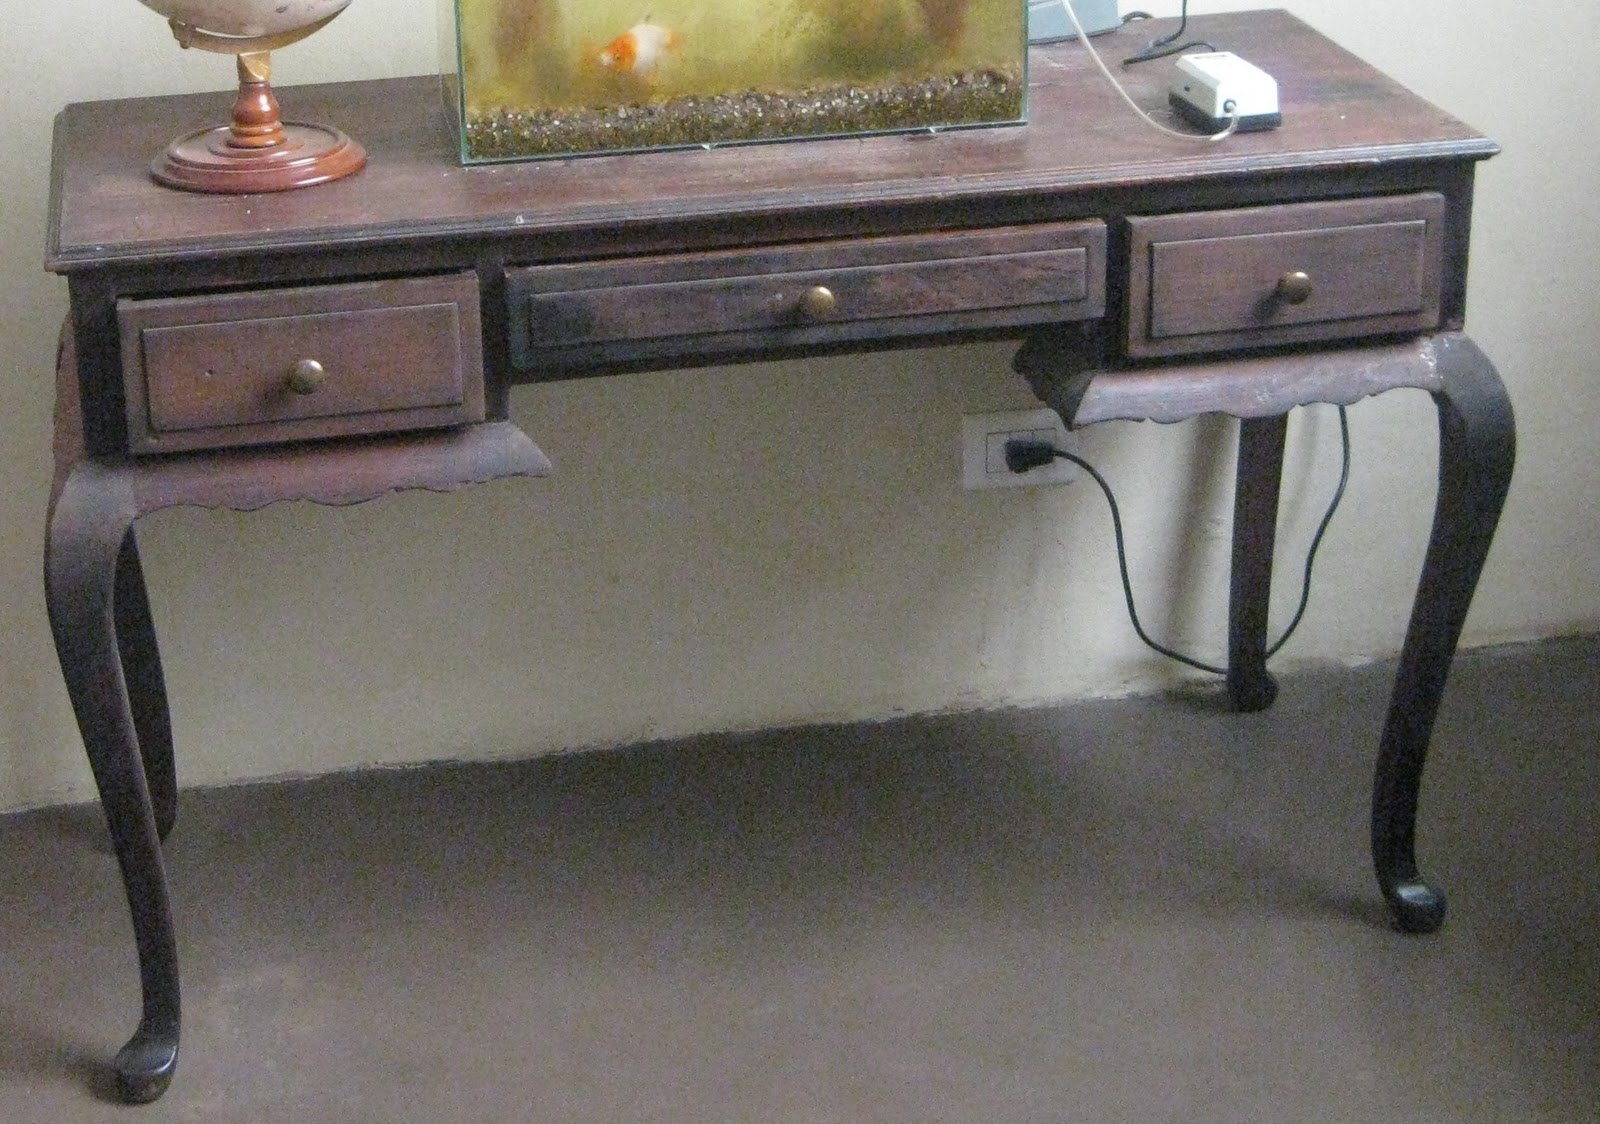 Mesa estilo Chippendale, múltiples usos 3 cajones frontales